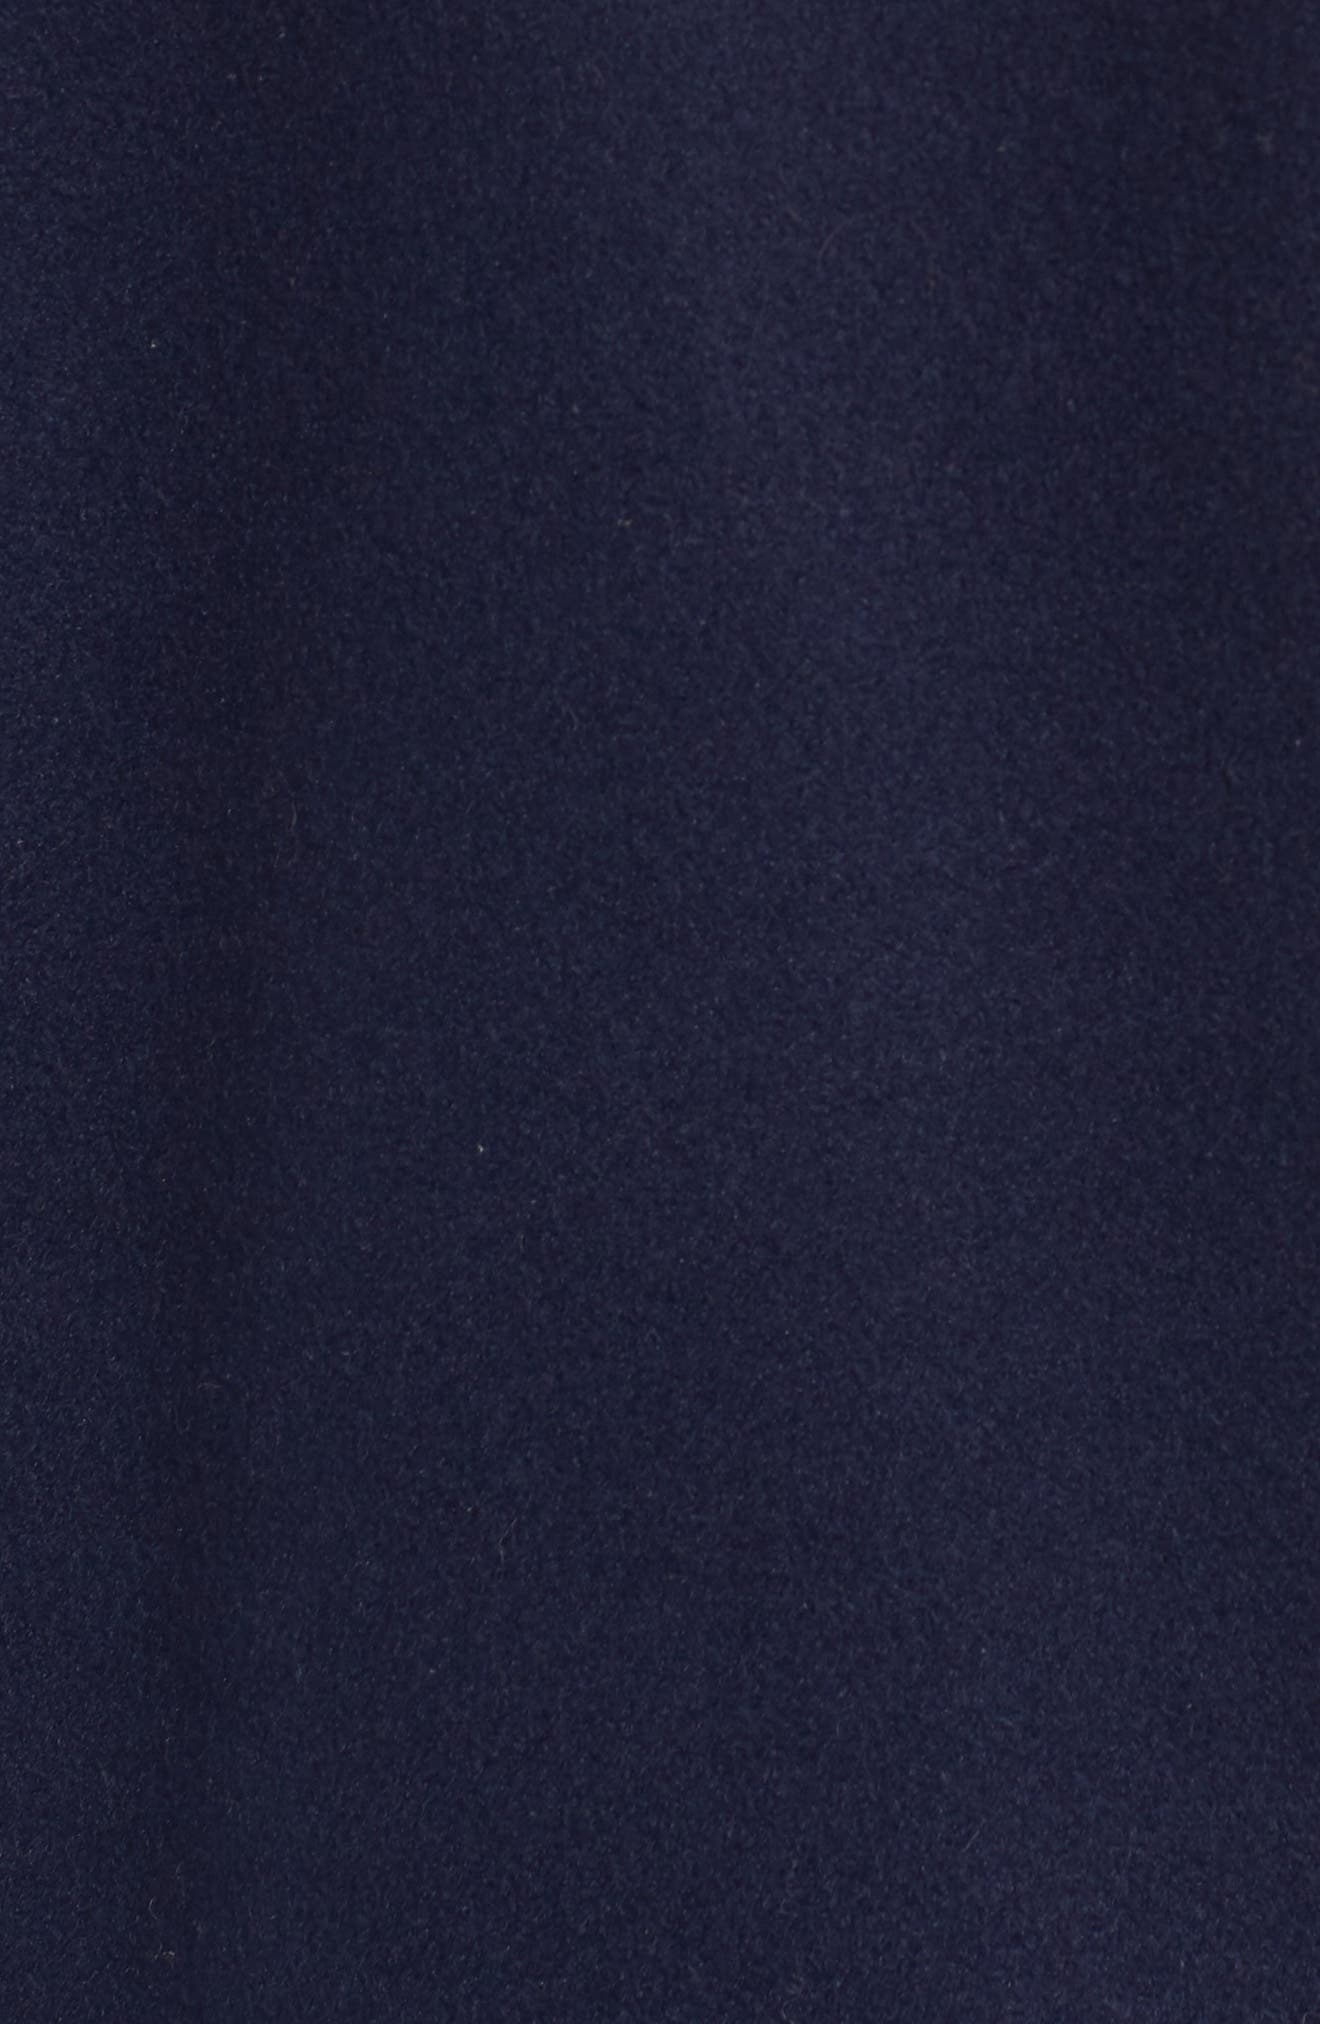 Cocoon Coat,                             Alternate thumbnail 7, color,                             400